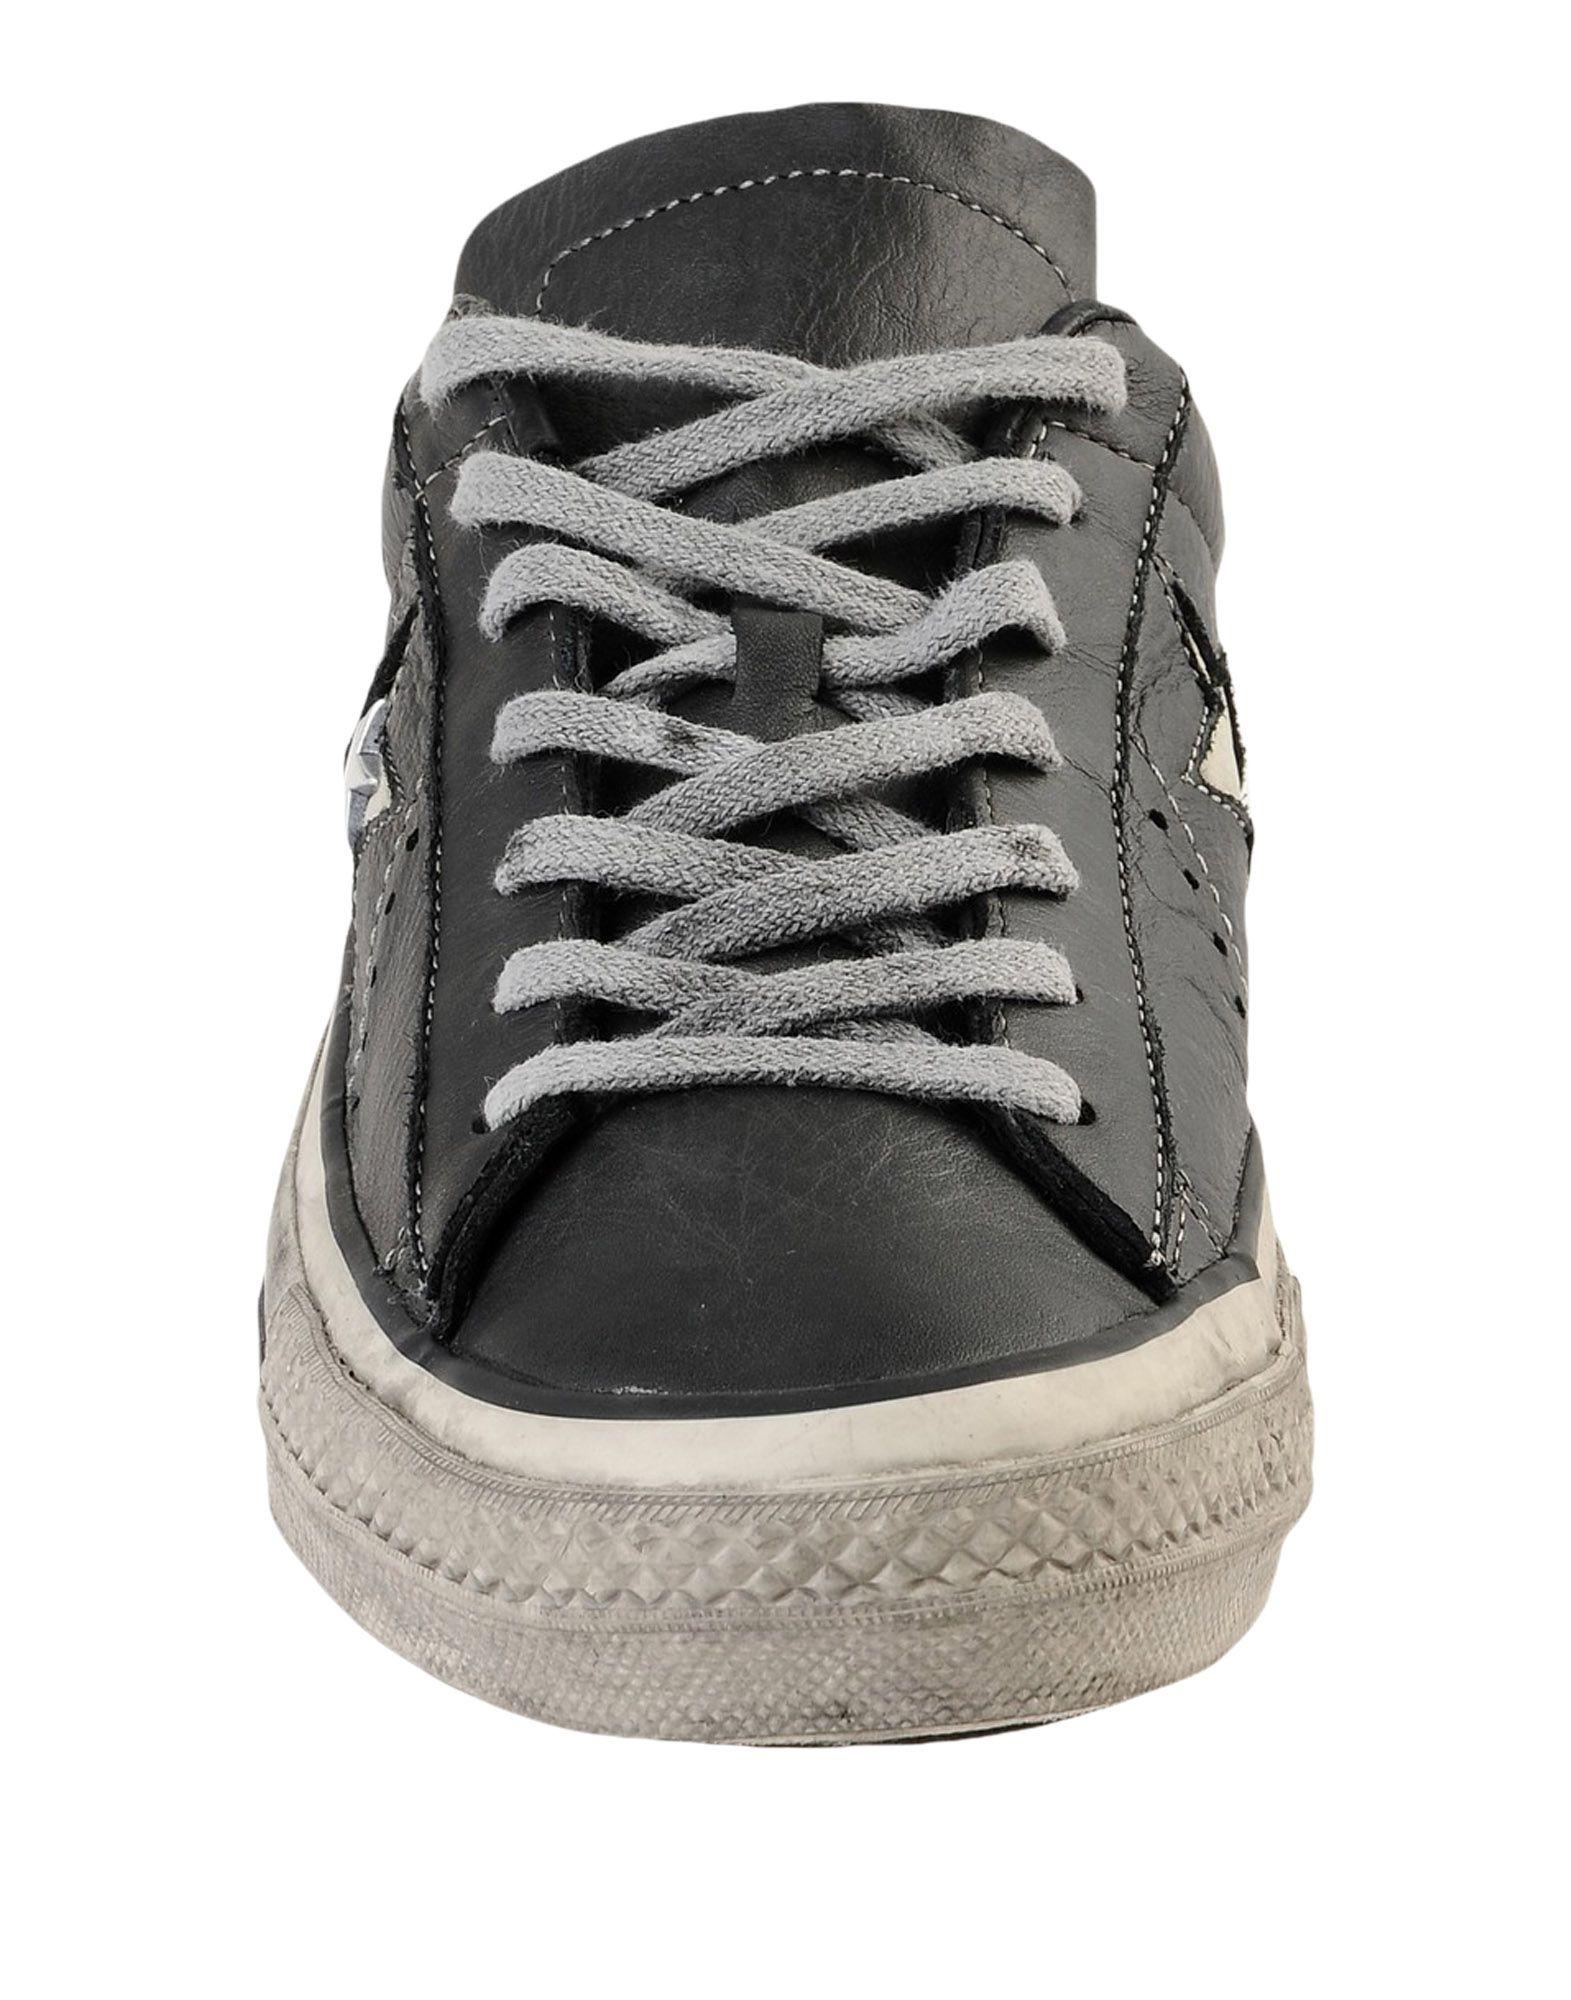 Converse Limited Edition Ctas Lift Leather  11551632AR Gute Qualität beliebte Schuhe